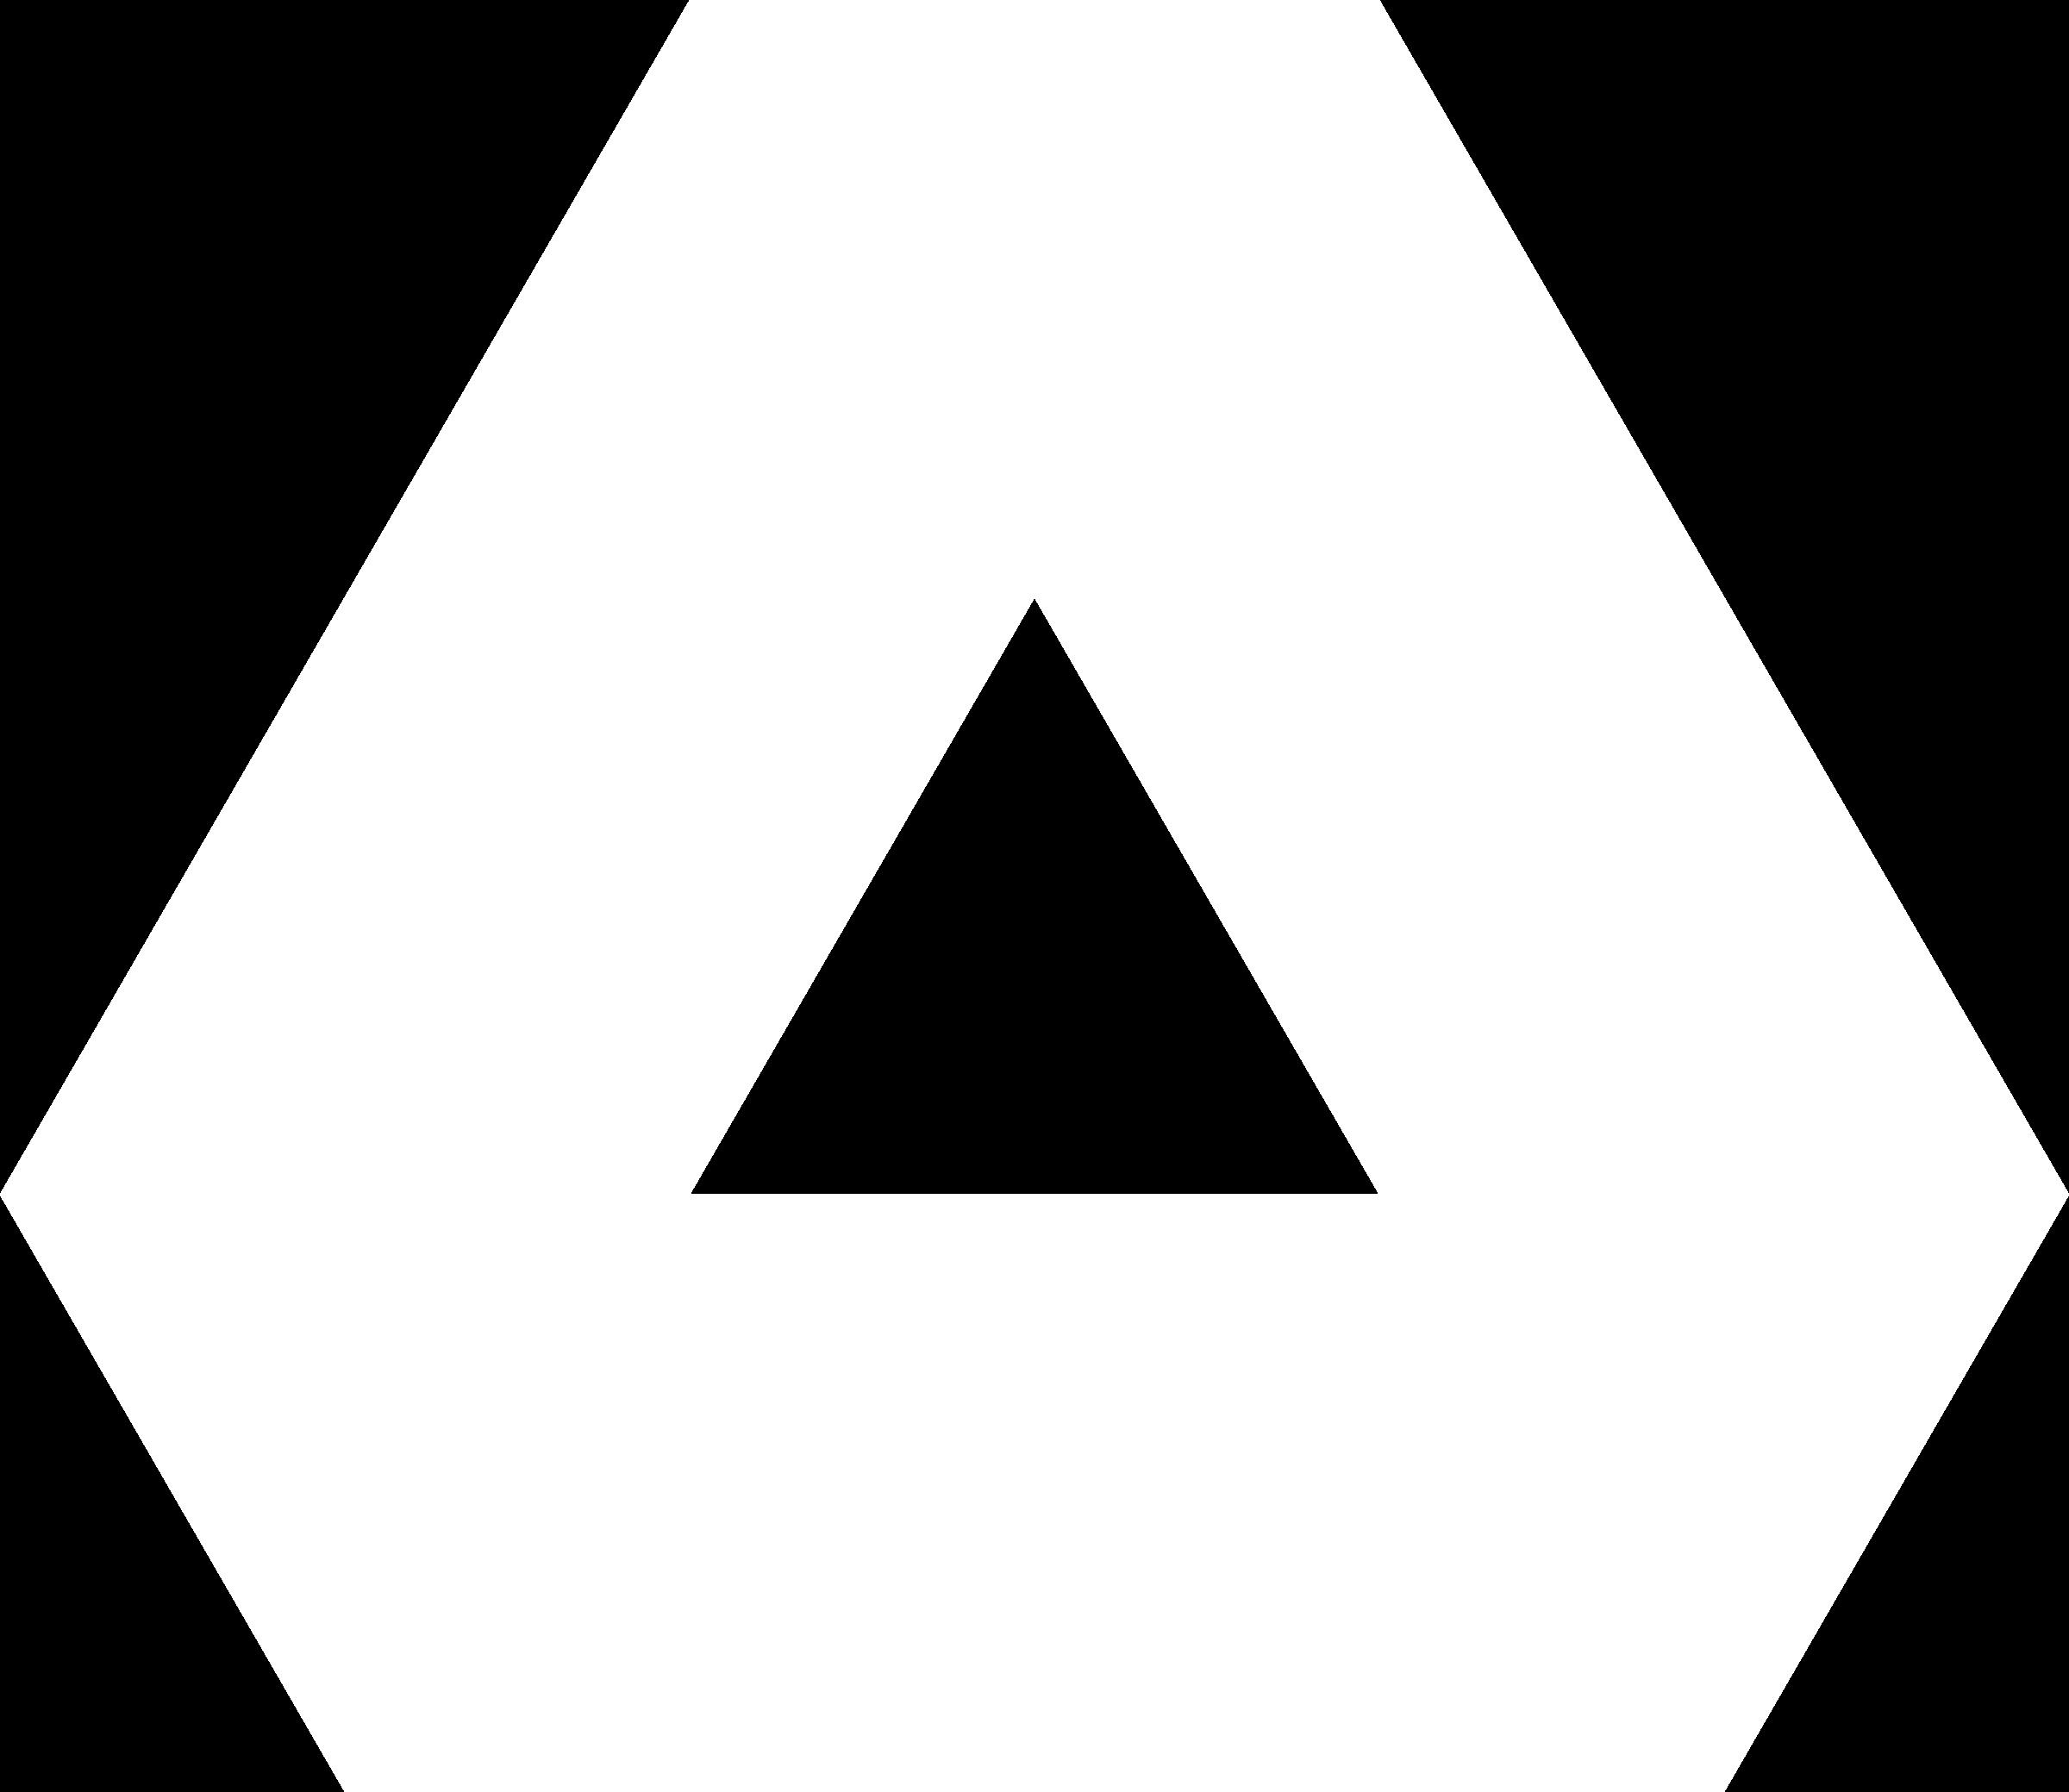 Black And White Google: Google Drive Logo PNG Transparent & SVG Vector